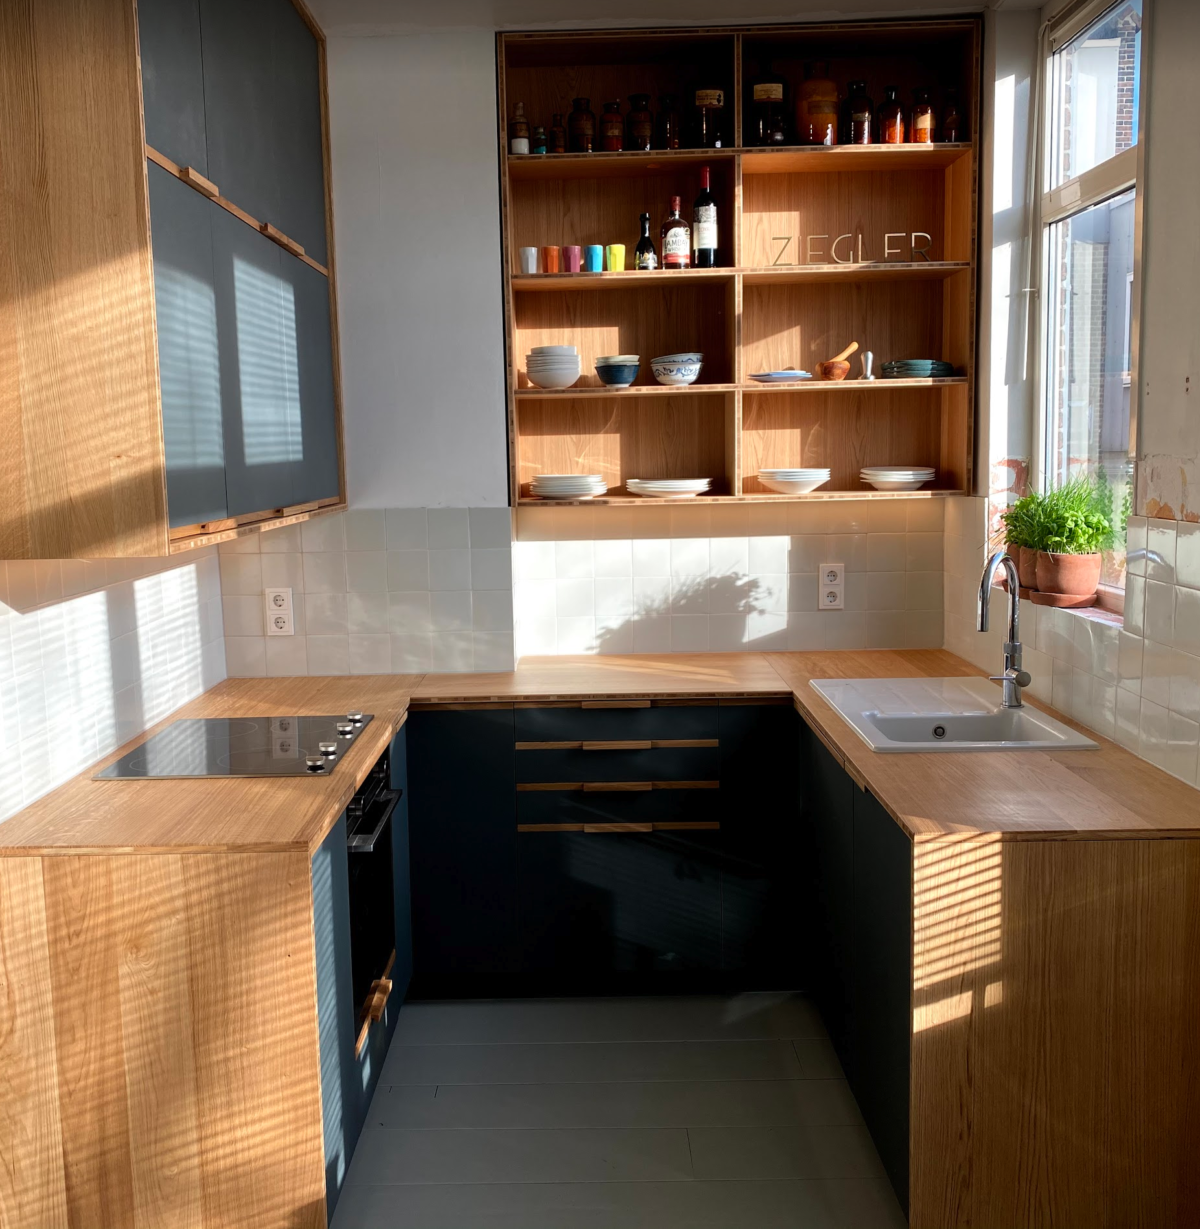 Een keuken kado